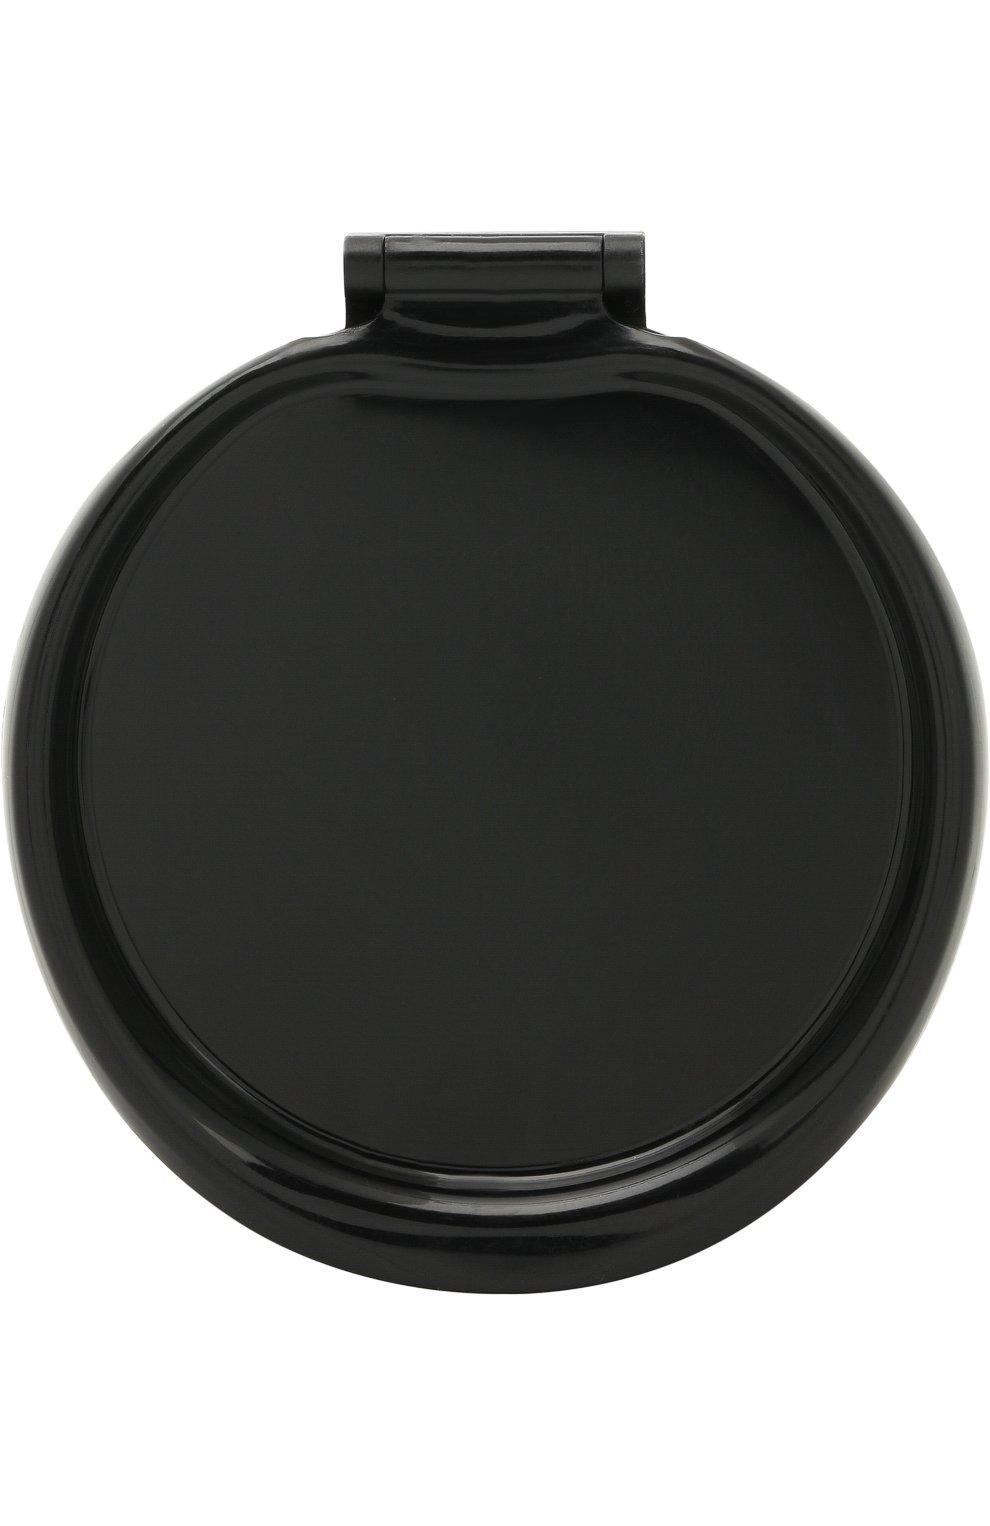 Увлажняющий праймер-кушон Fresh Tint refill, оттенок Beige | Фото №3